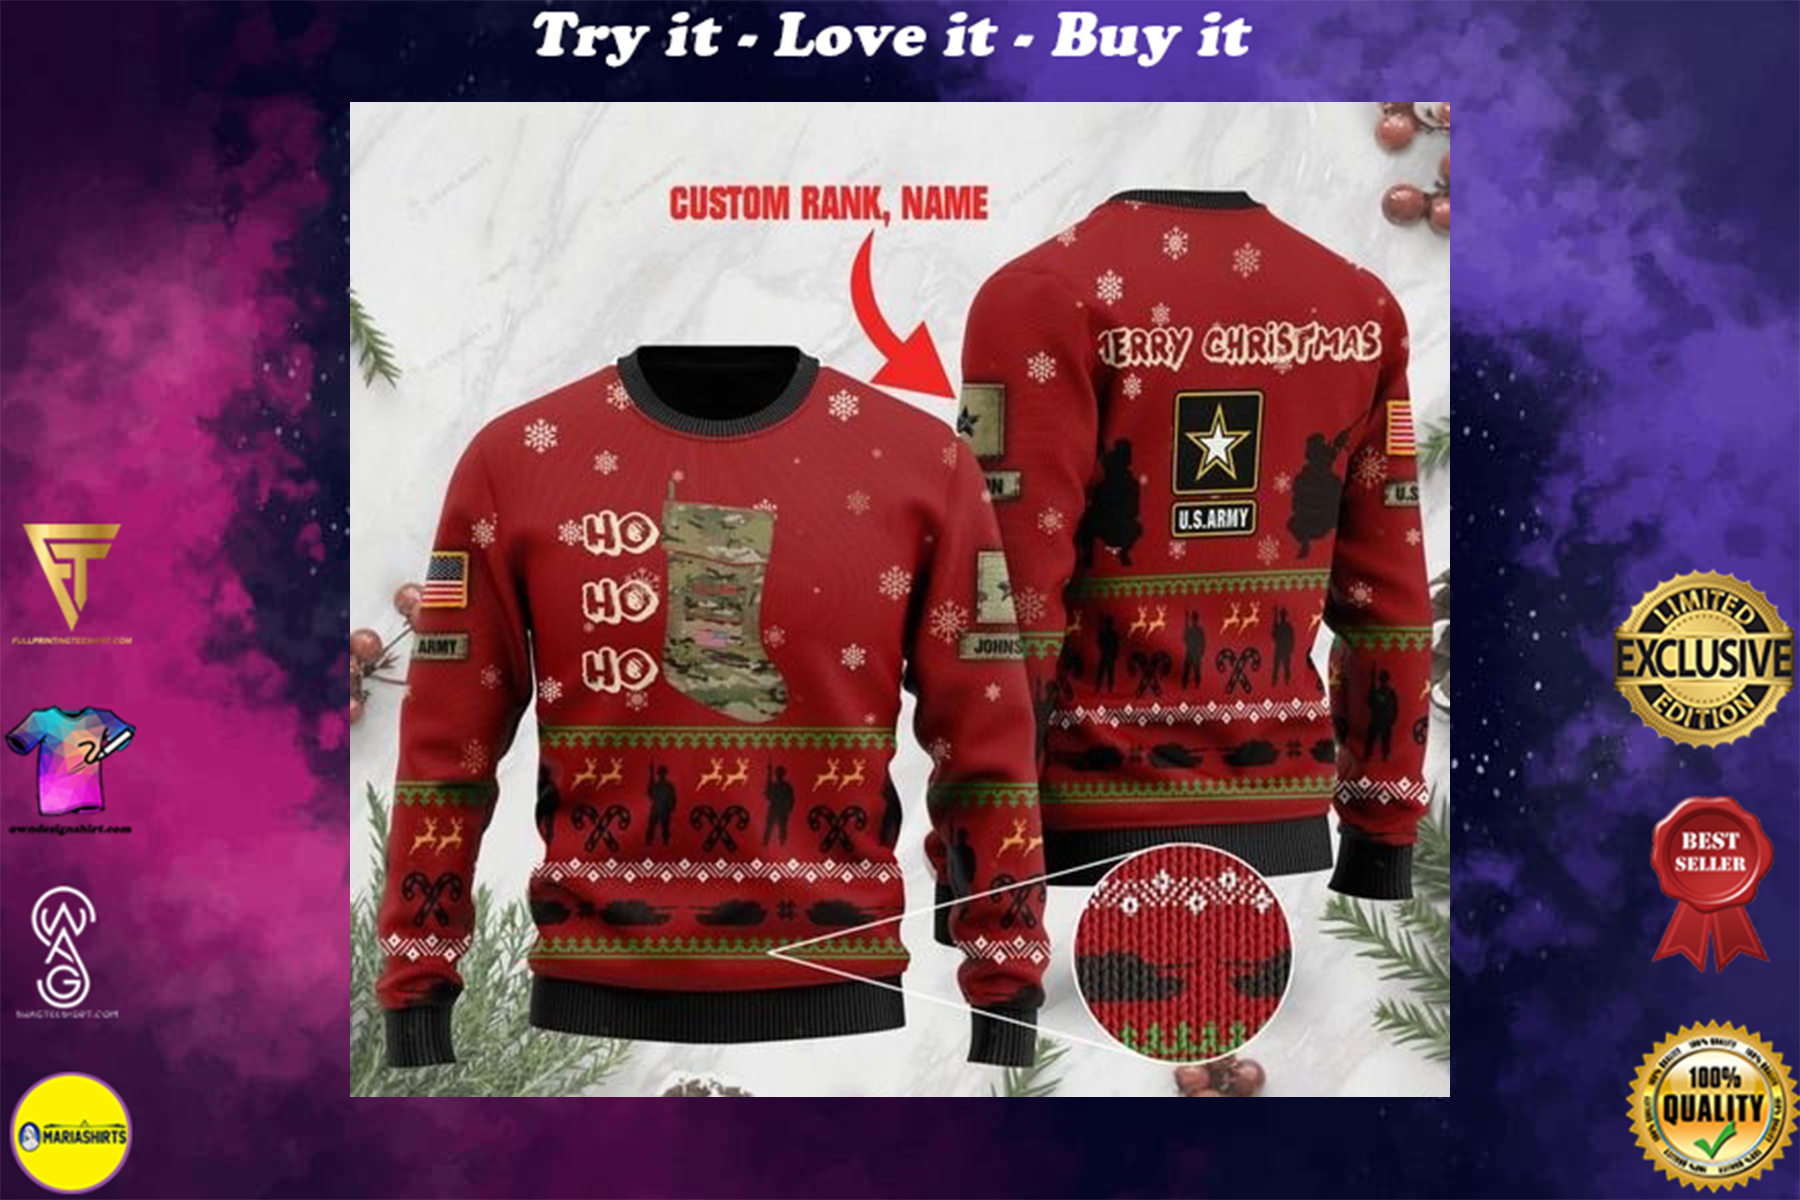 [highest selling] custom rank and name us army ho ho ho christmas time full printing ugly sweater - maria